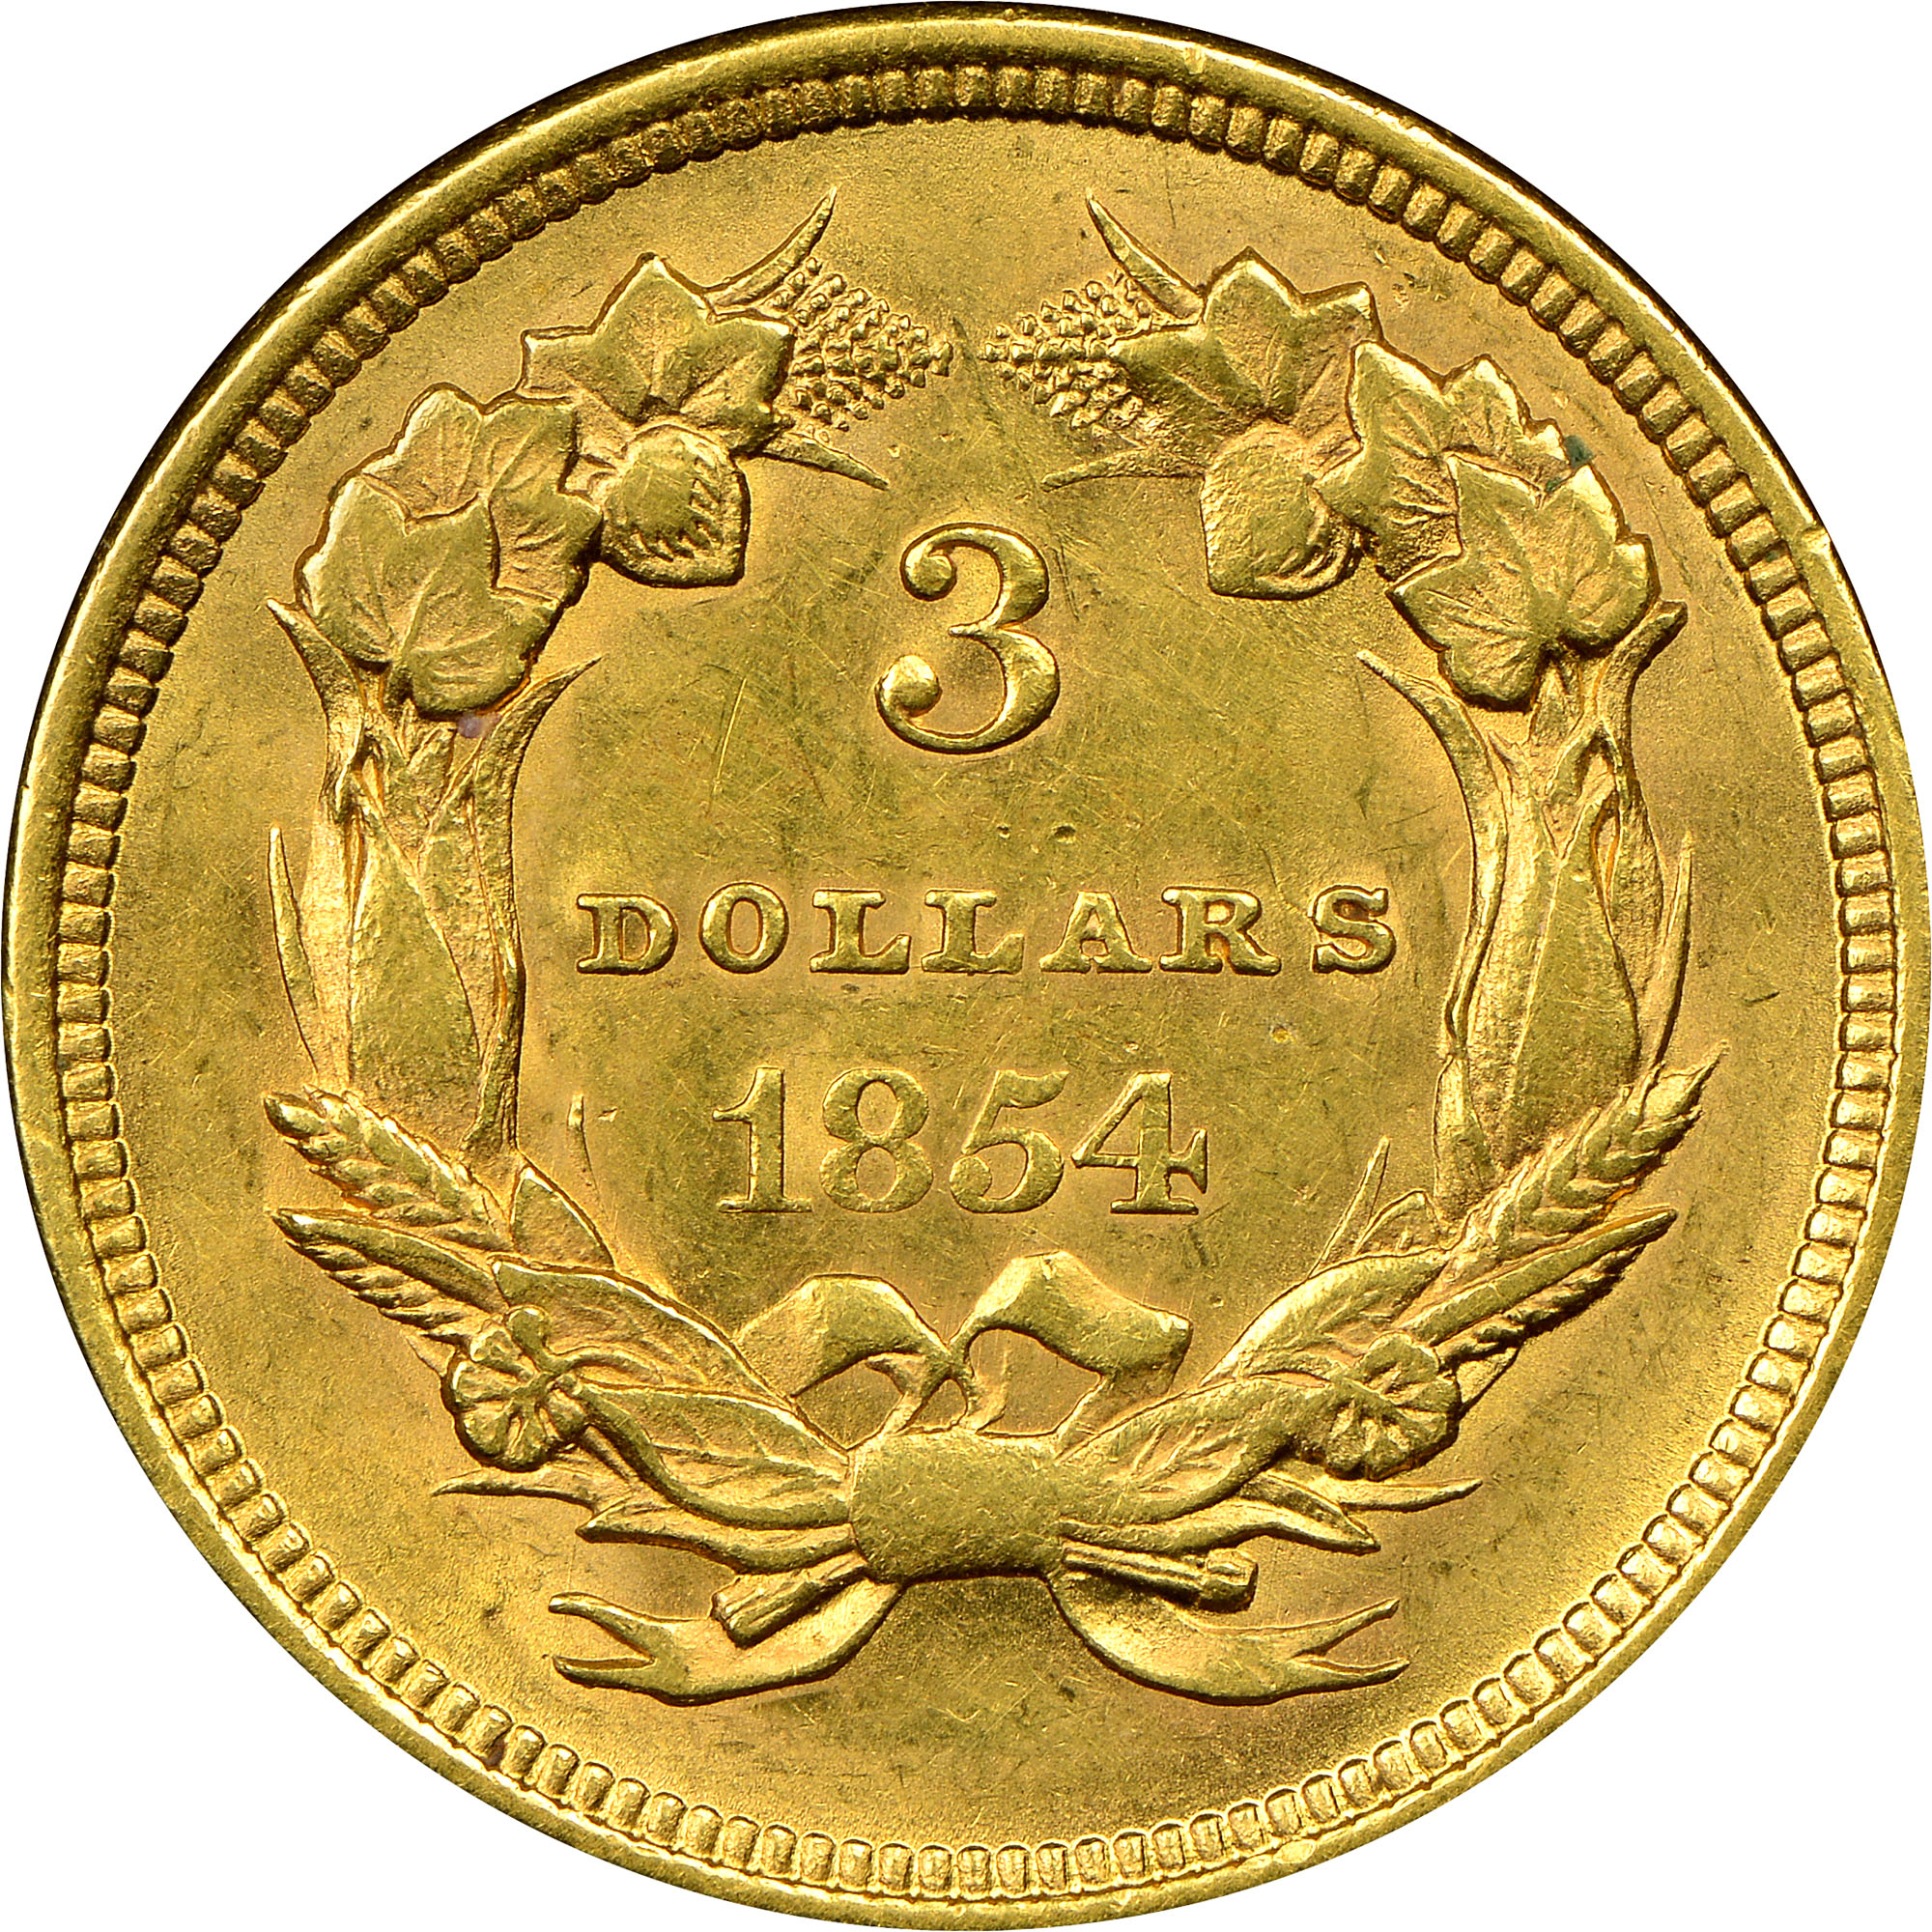 1854 3 ms three dollar gold ngc